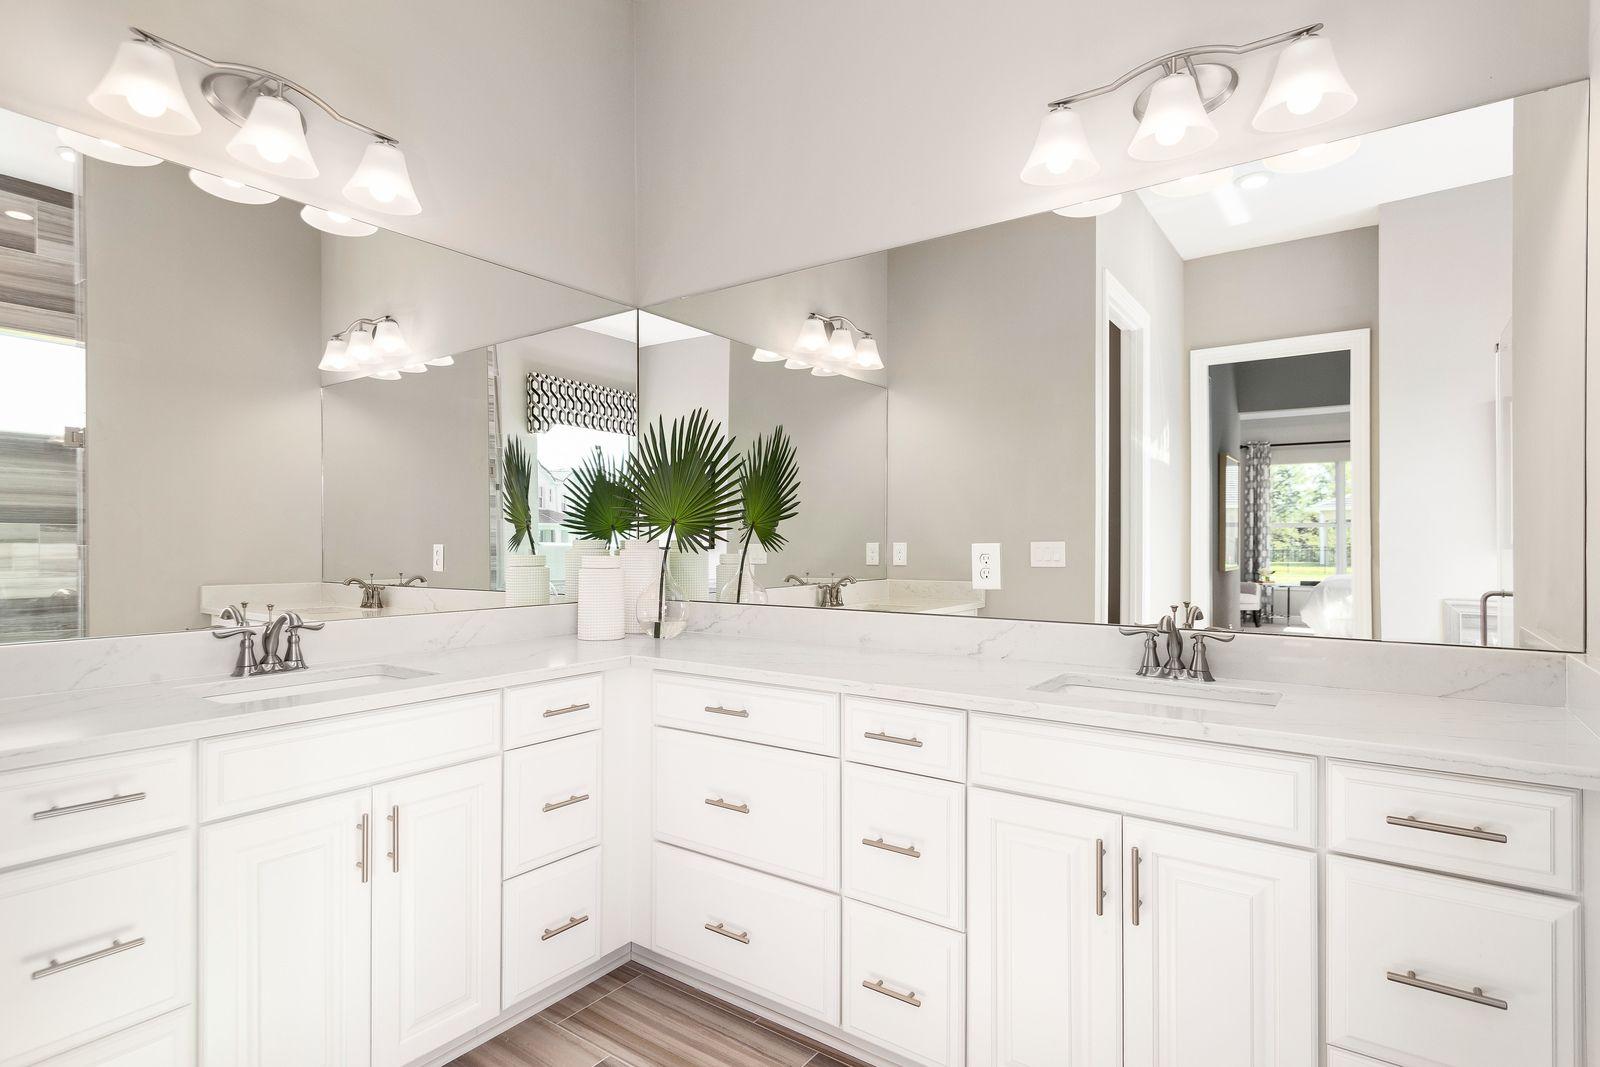 Bathroom featured in the Hernando By Ryan Homes in Martin-St. Lucie-Okeechobee Counties, FL